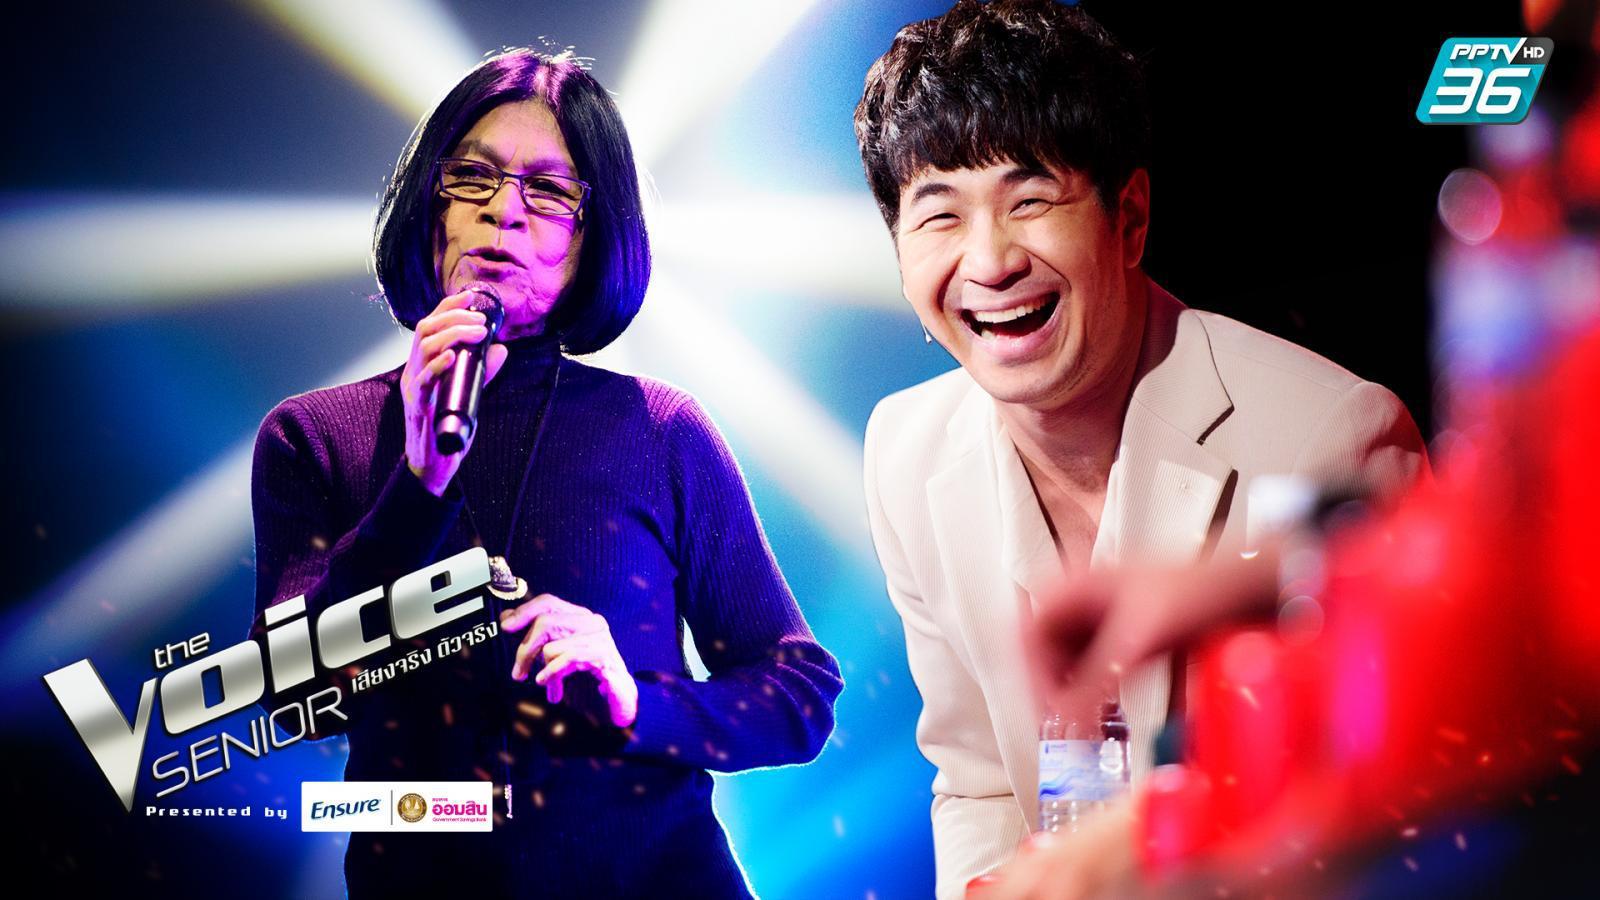 "The Voice Senior Thailand 2020 EP.2 | เสียงสุดคลาสสิค ต้นฉบับเพลง ""น่ารัก"" ประกอบภาพยนตร์วัยอลวน เวอร์ชั่นแรก!"